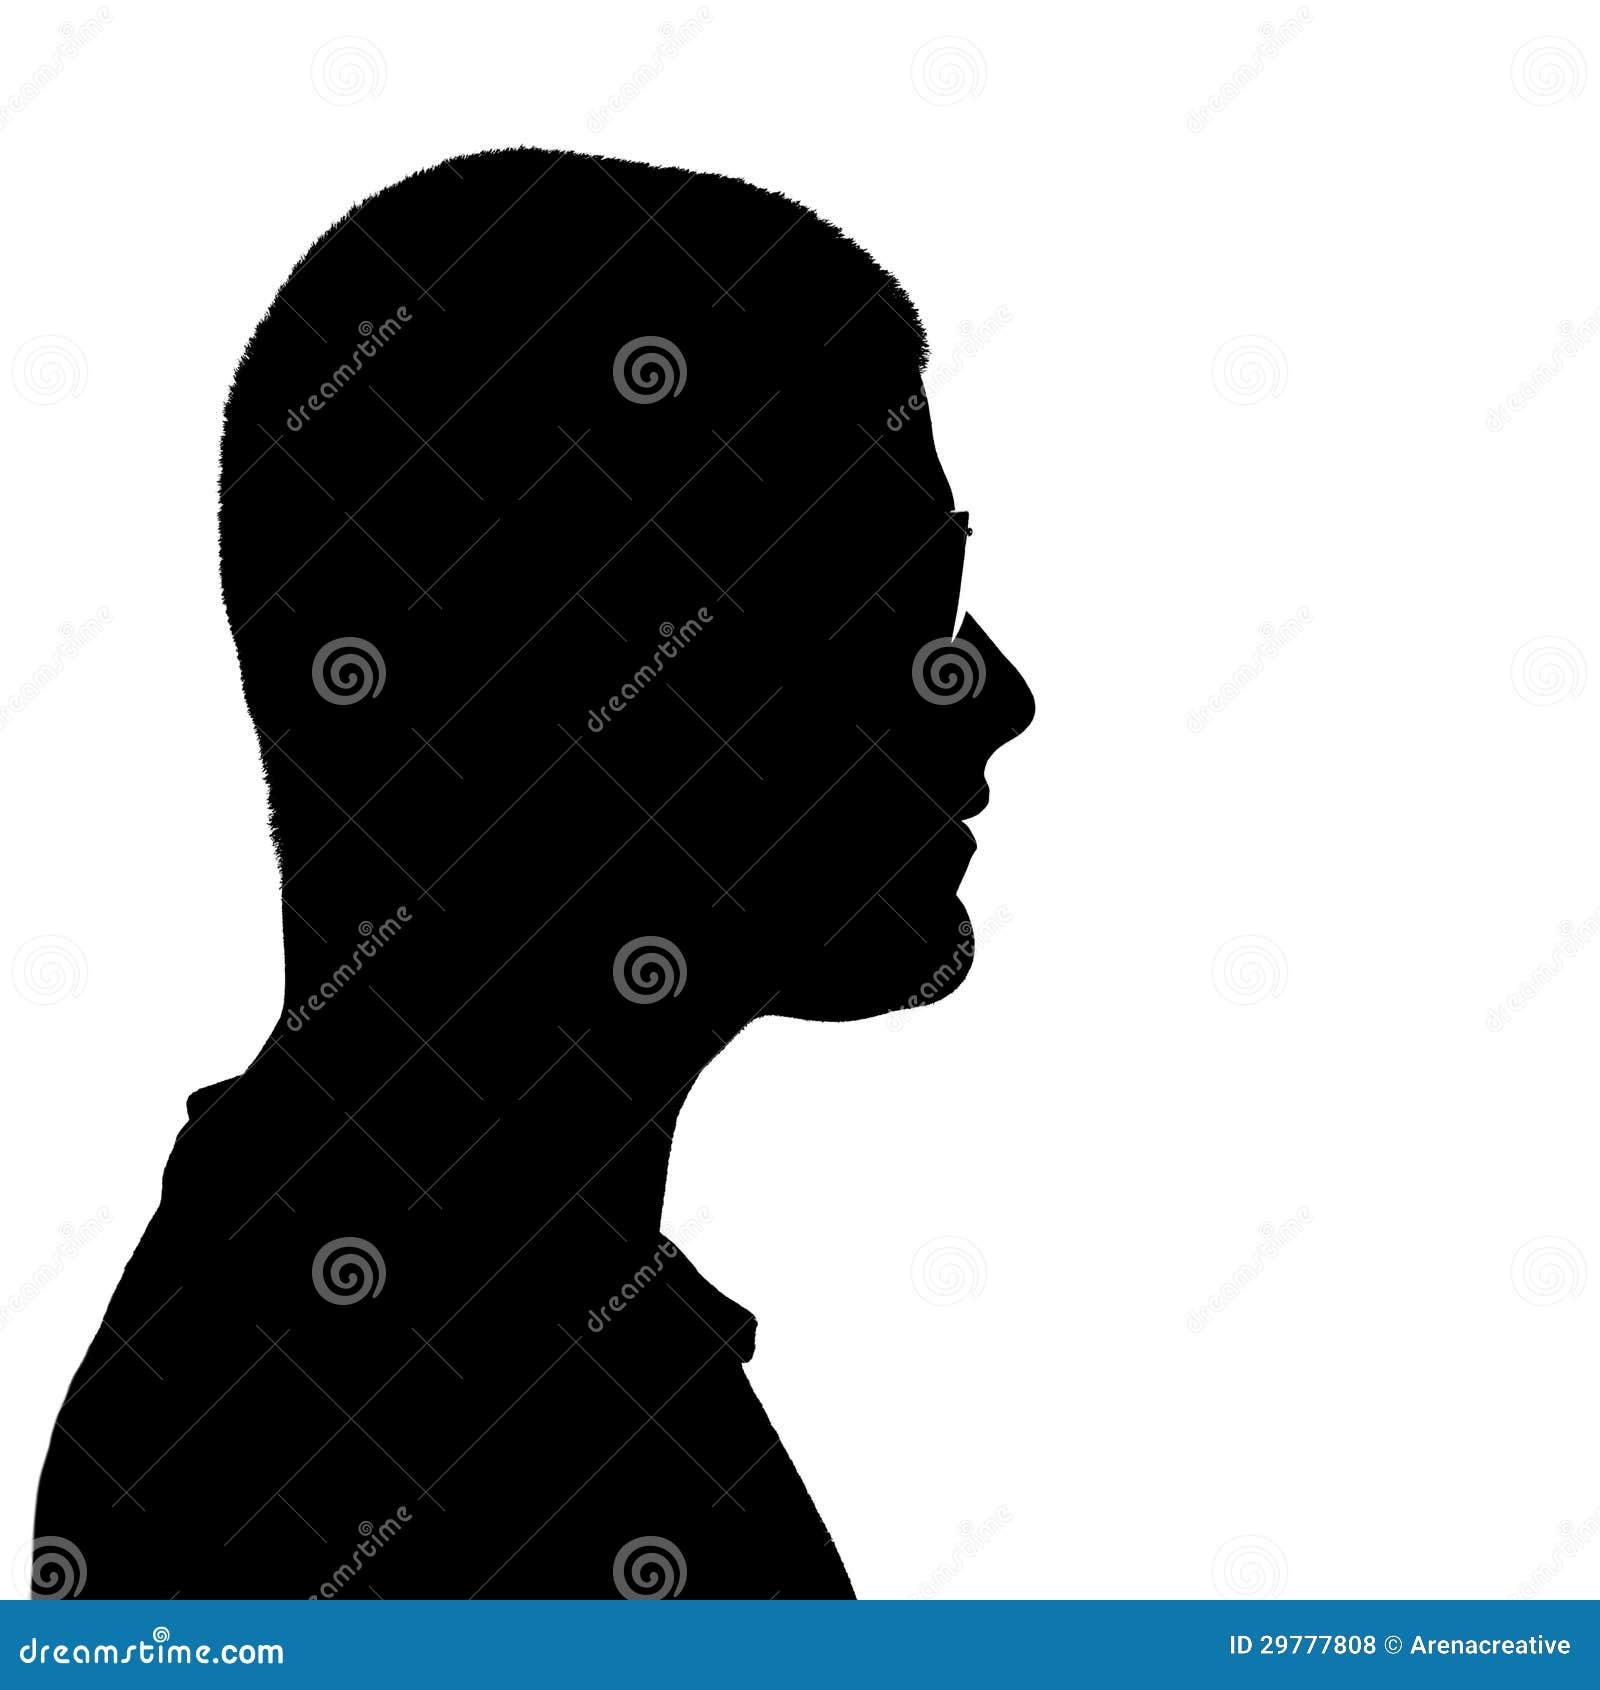 image Search profile of man erotic